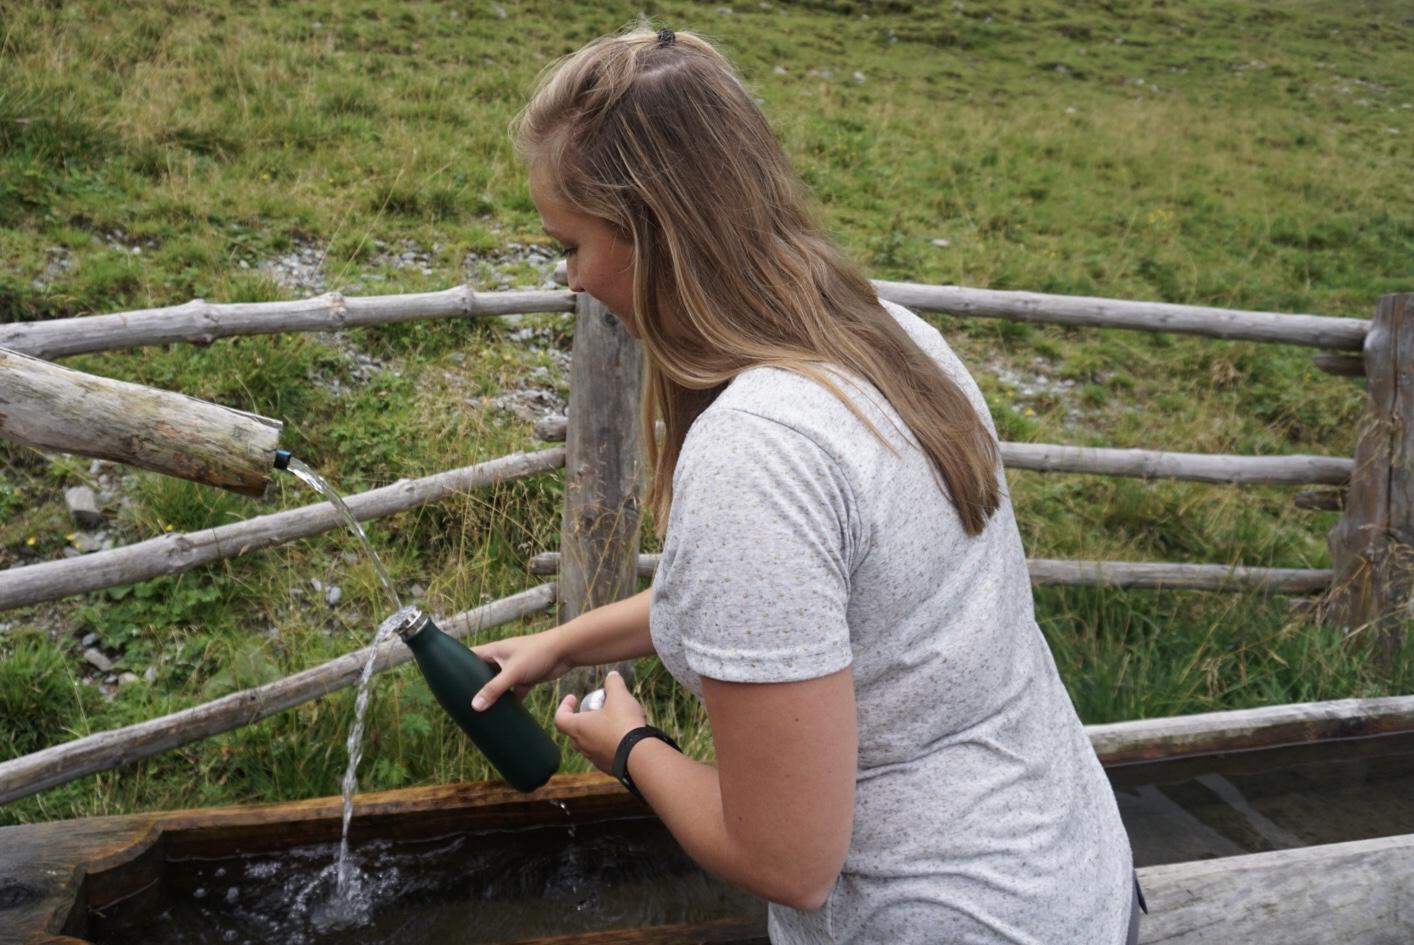 Reusable drinking bottle sustainable tourism travelrebel